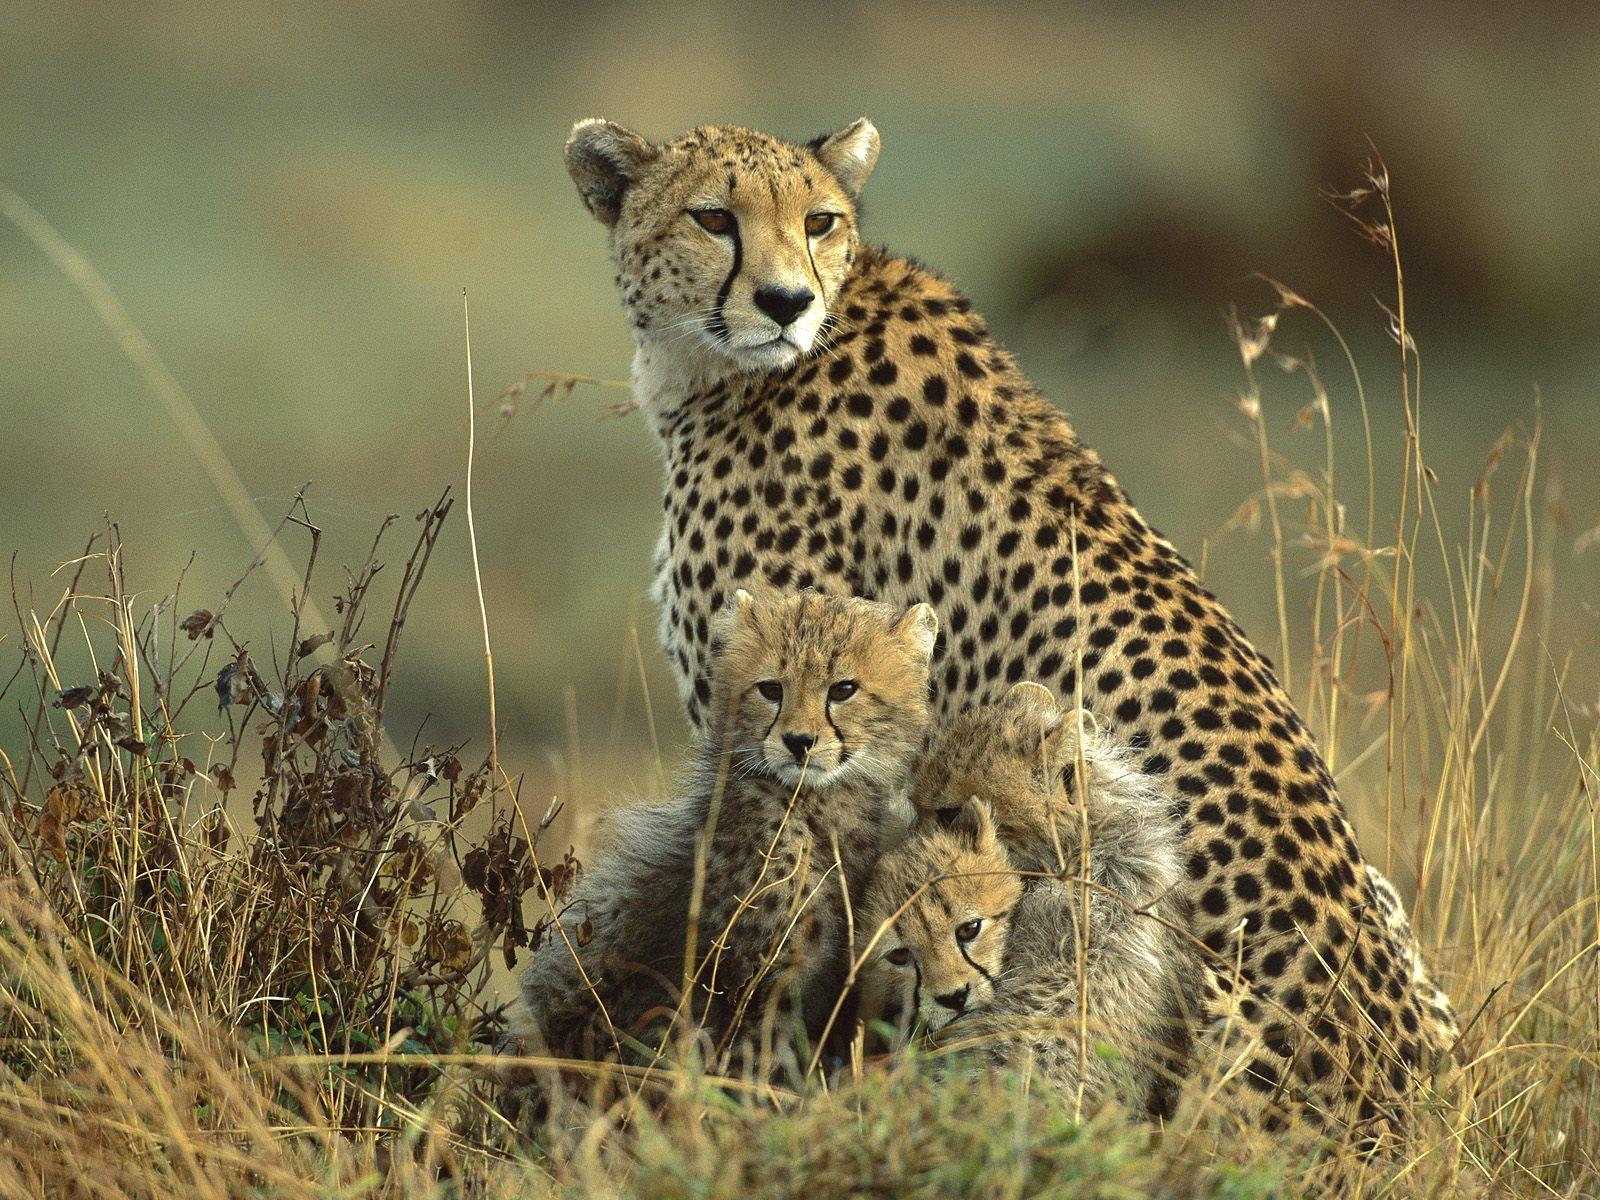 cheetah wallpapers free download